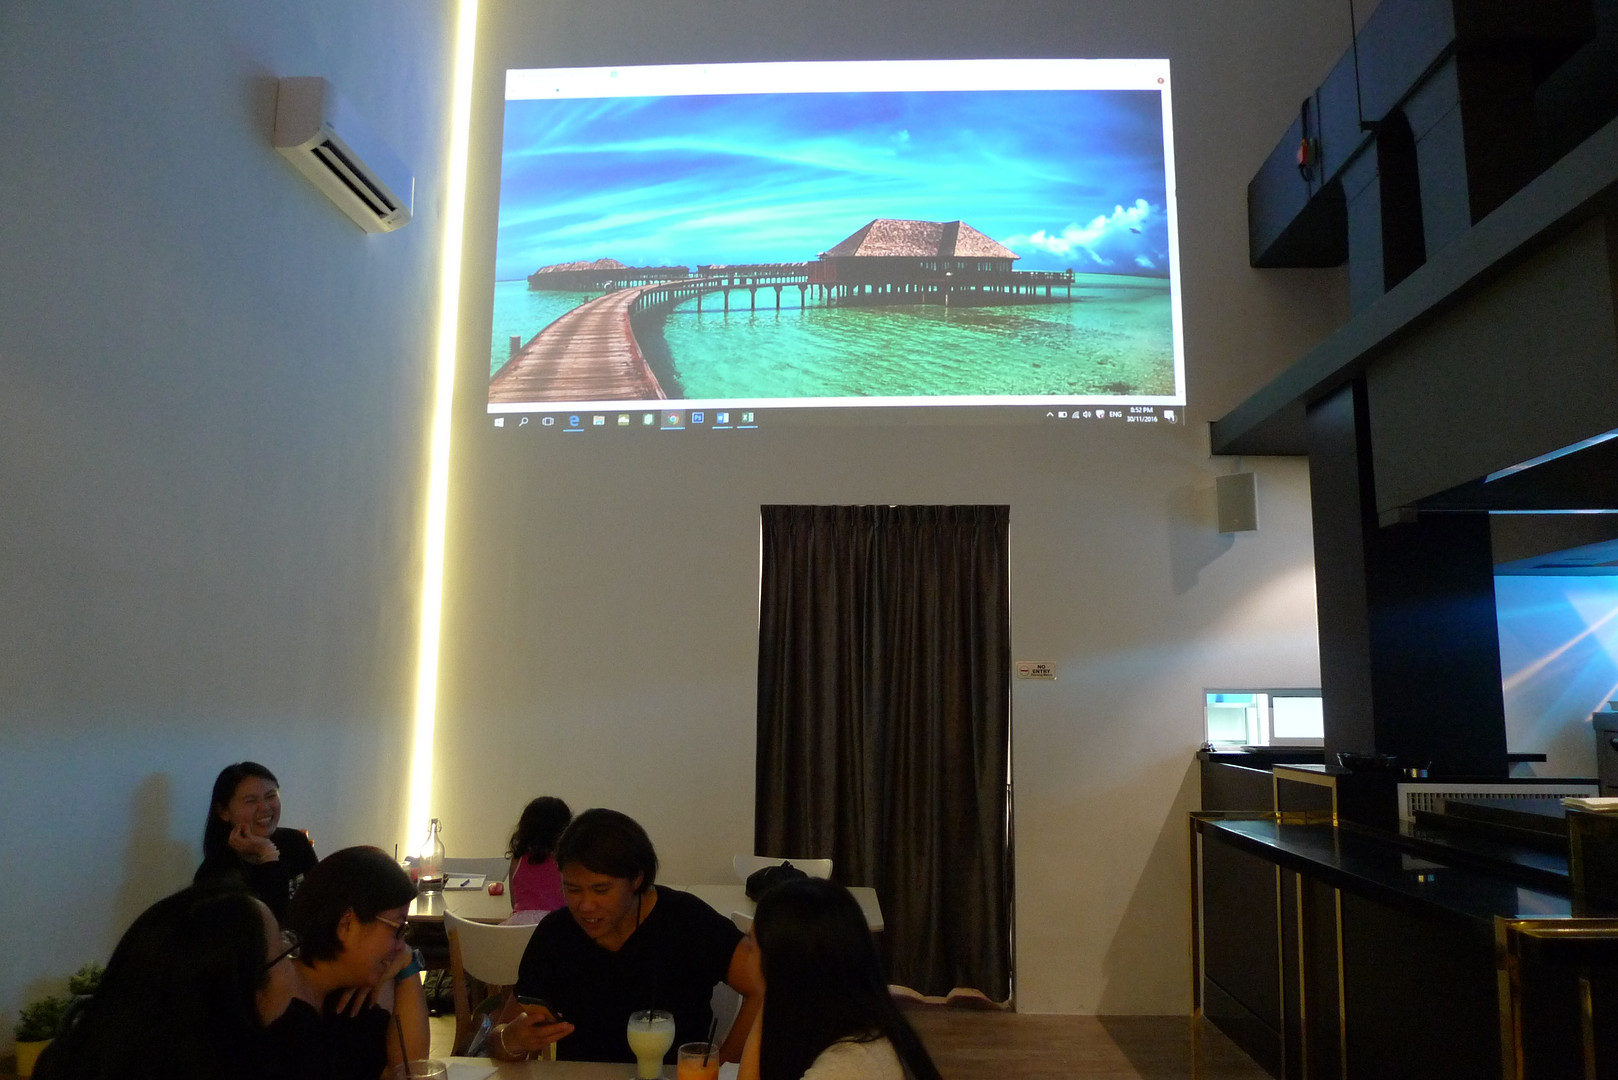 Wall projector